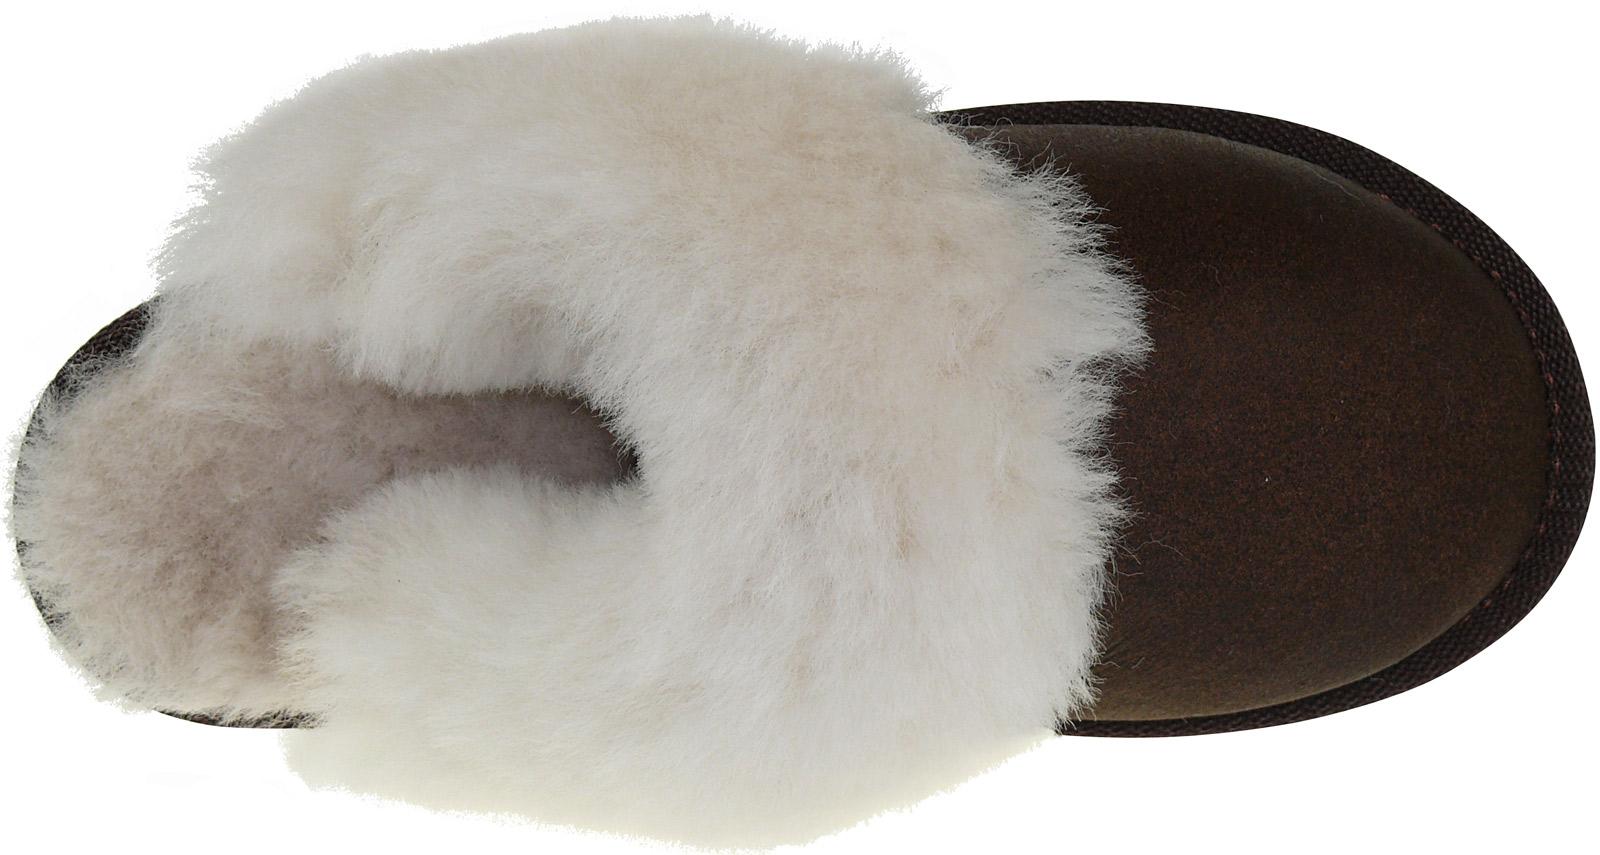 fbc13252b8b2 Extra dicke Lammfell Pantoffeln für Damen in 5 Farben Fellartikel ...